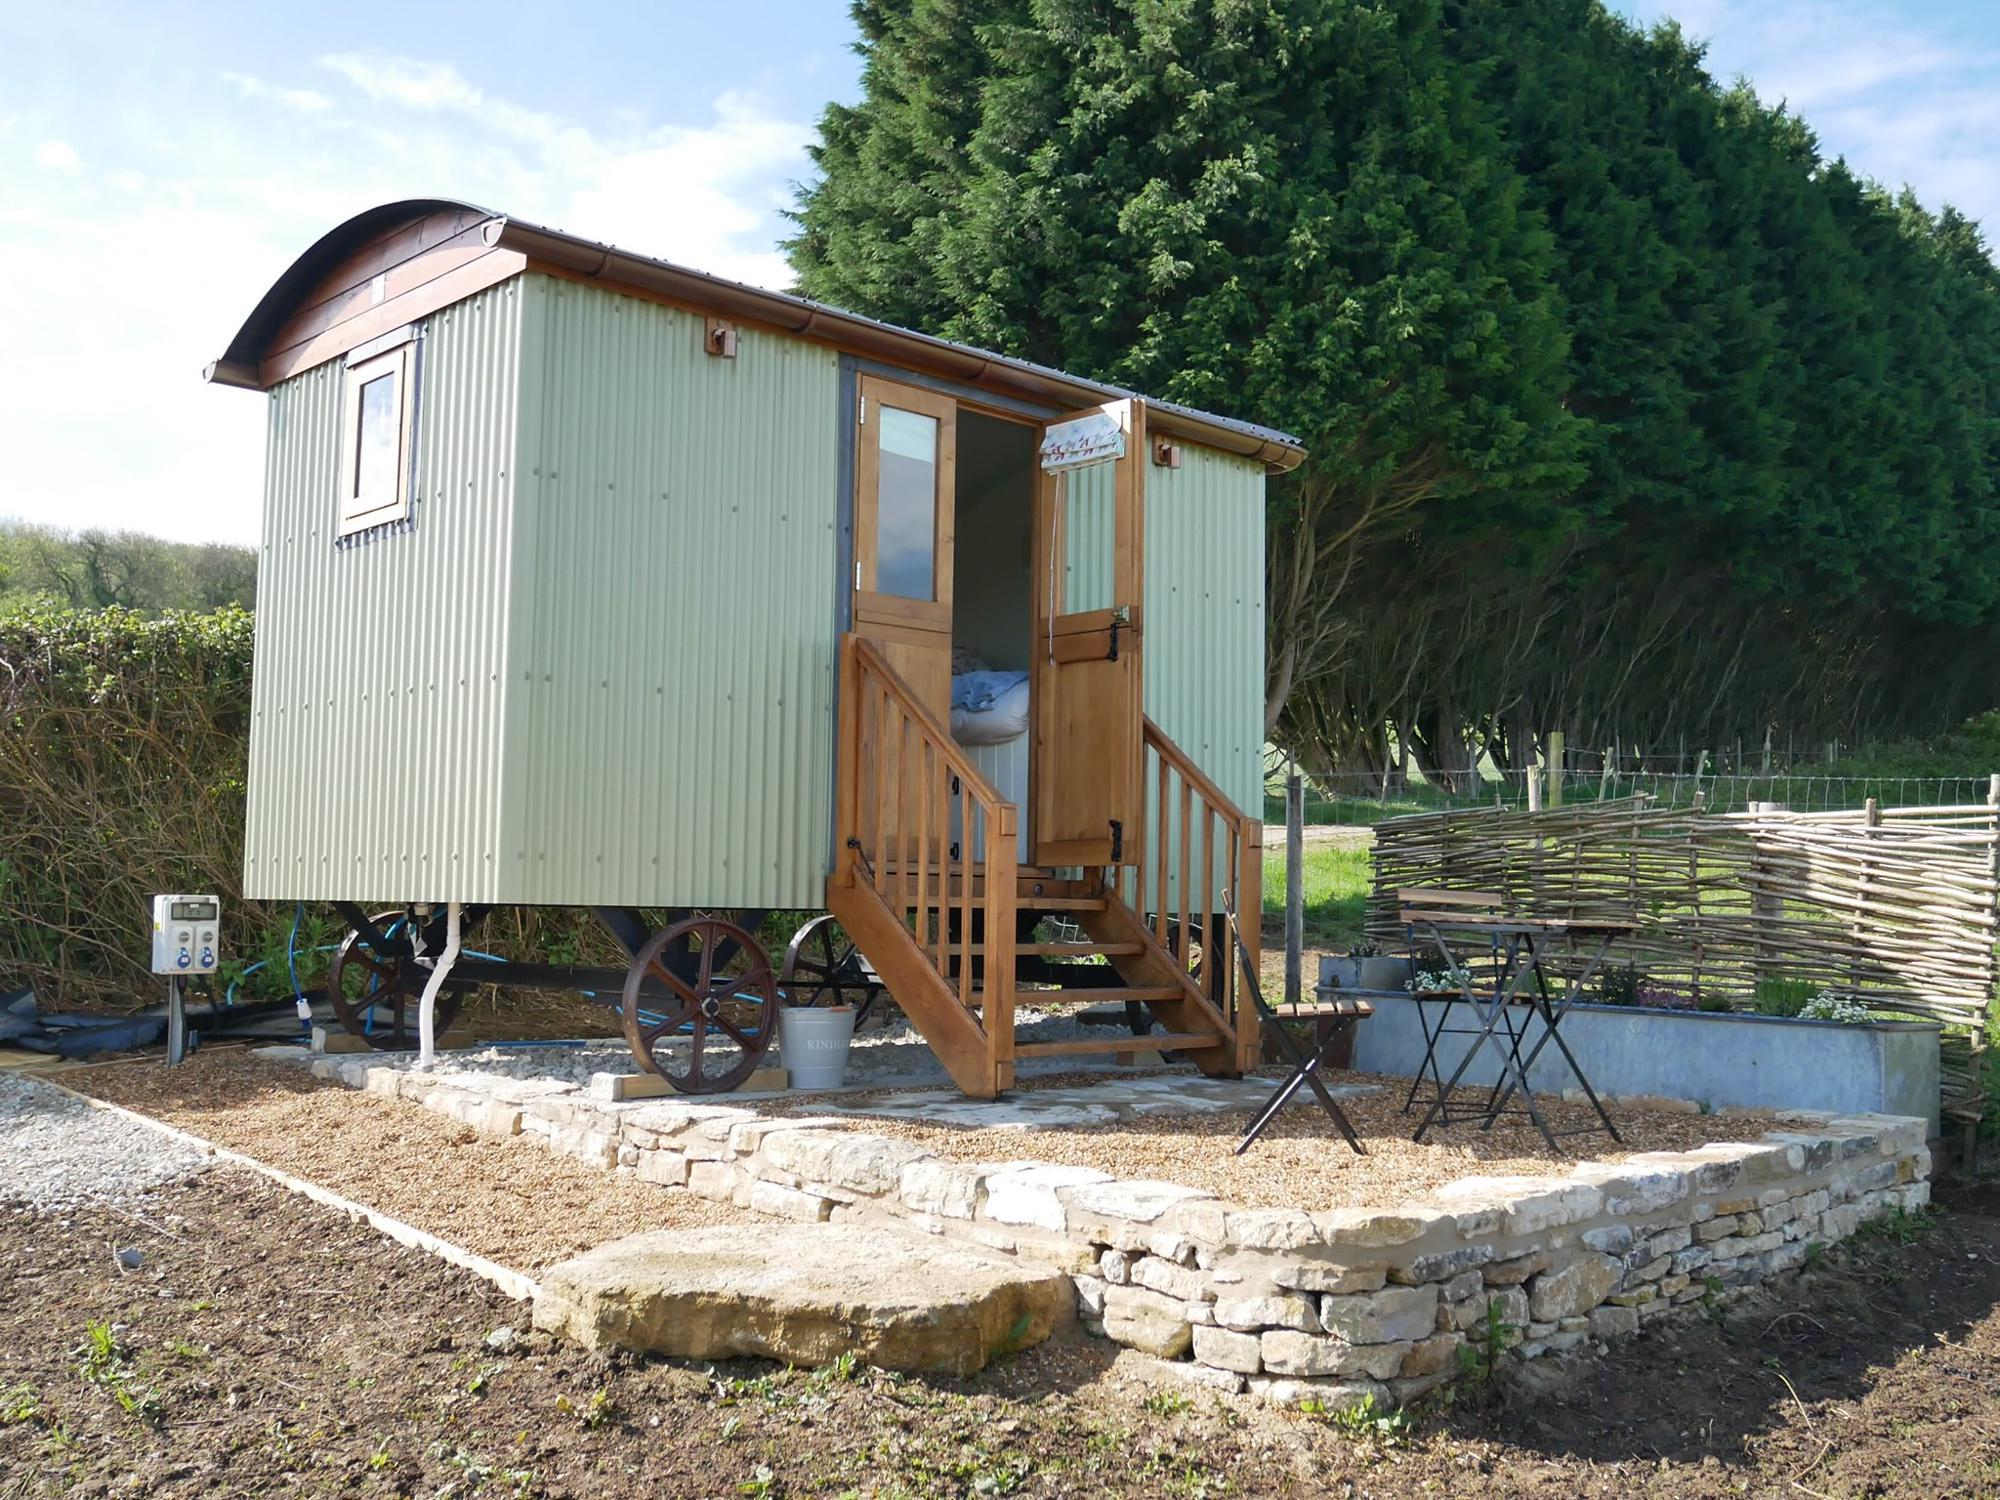 The Keepers Hut at Downshay Farm